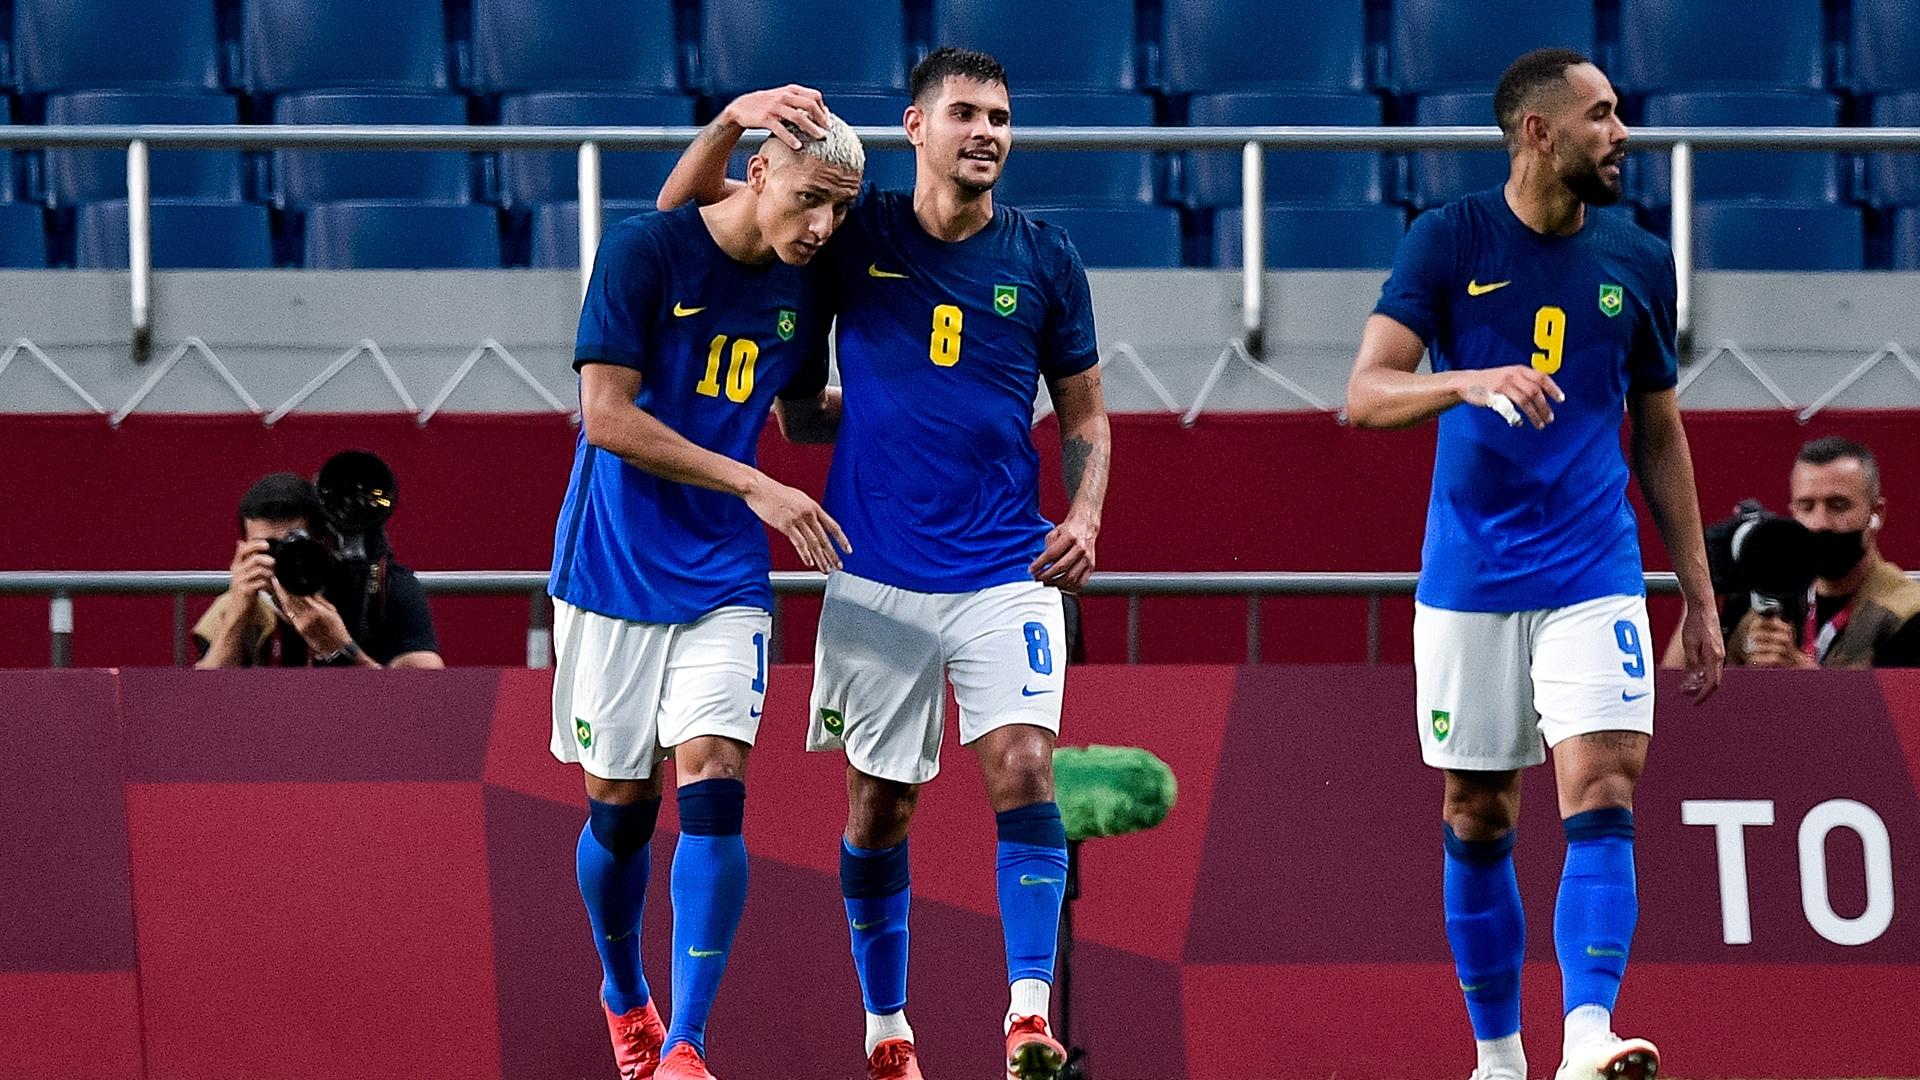 Image for Men's soccer gold medal match combined XI: Brazil v. Spain